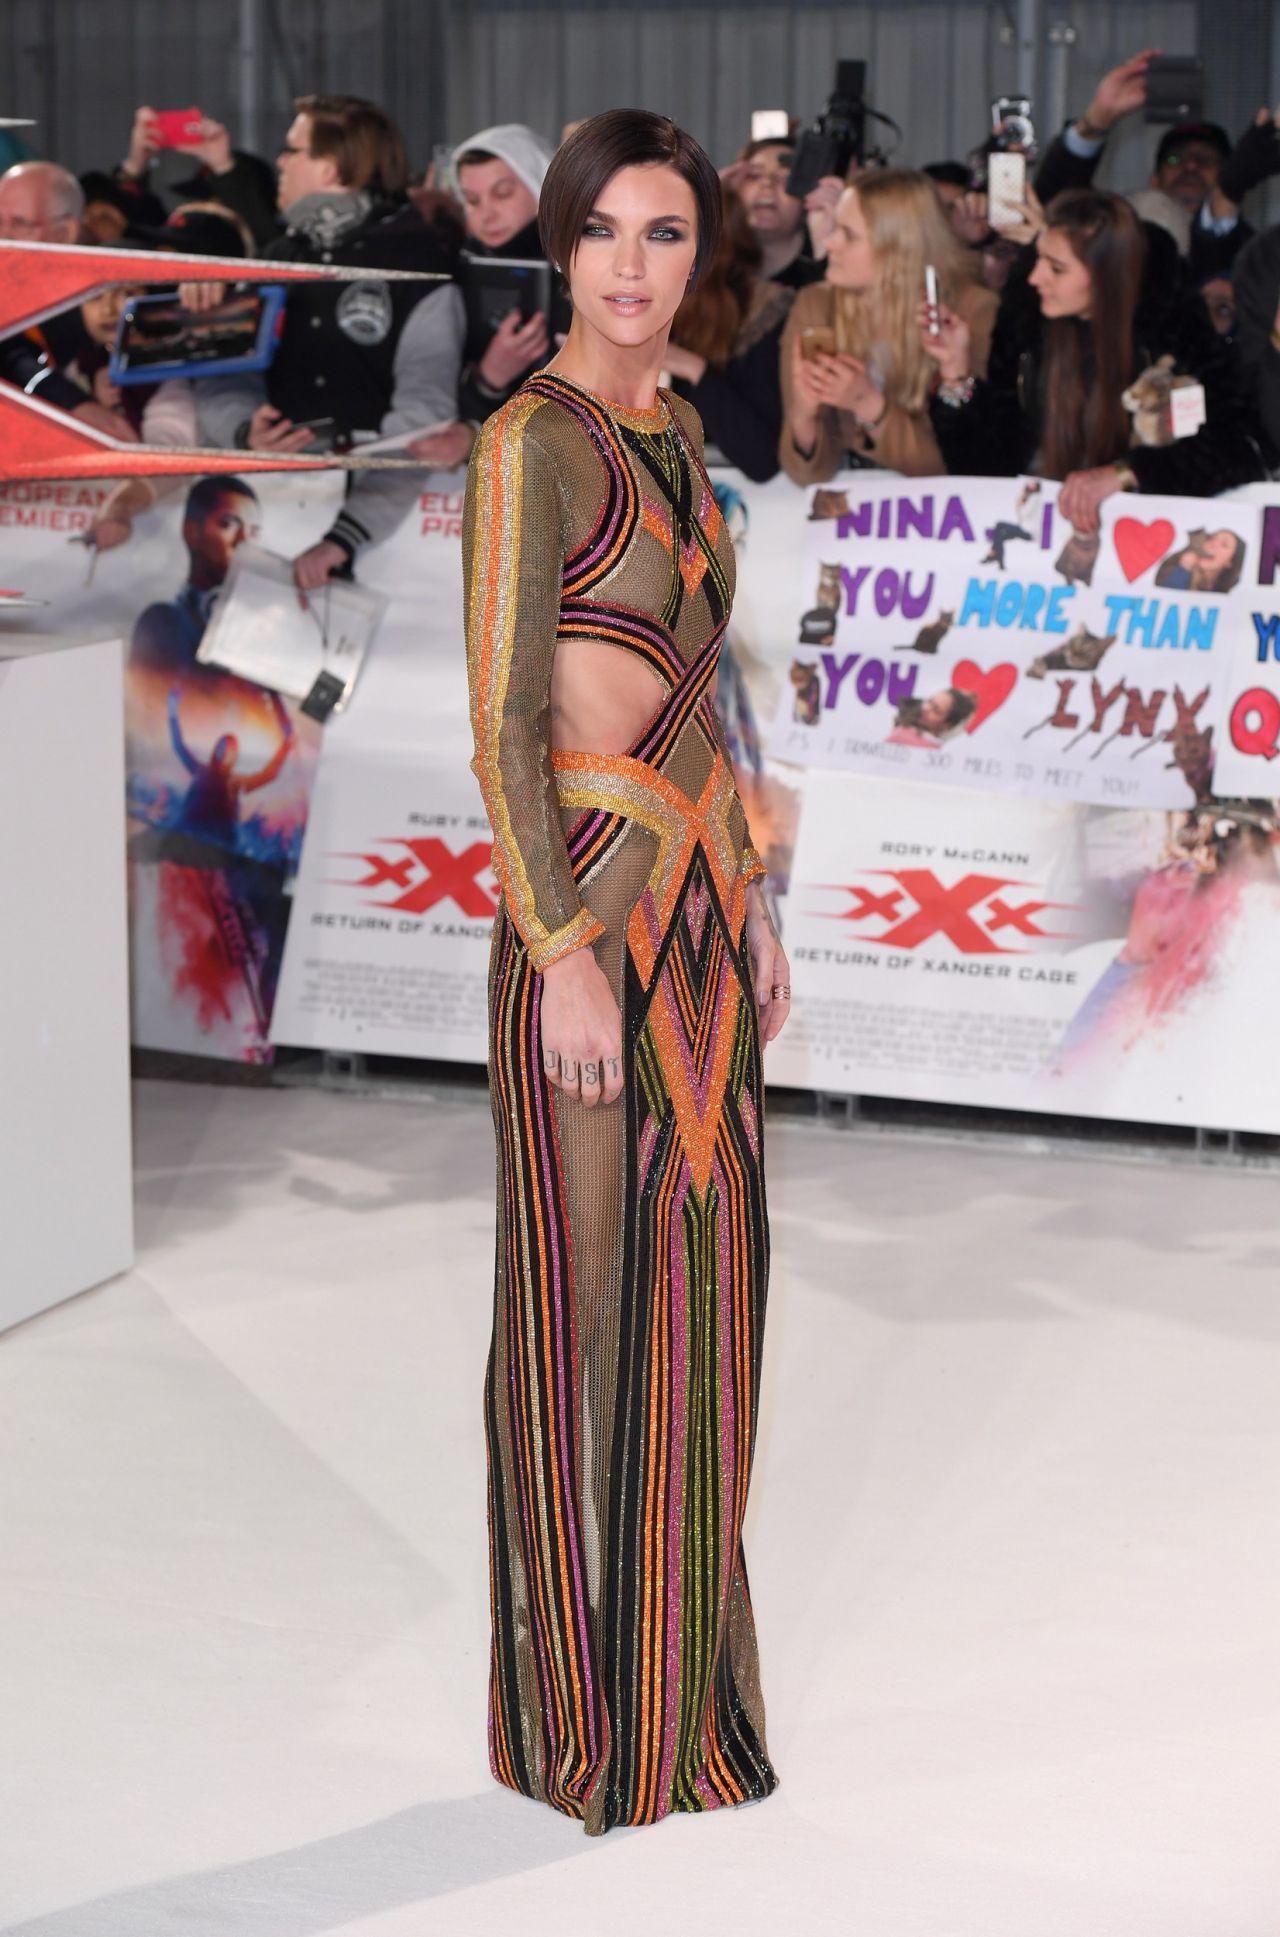 Ruby Rose Xxx Return Of Xander Cage European Premiere